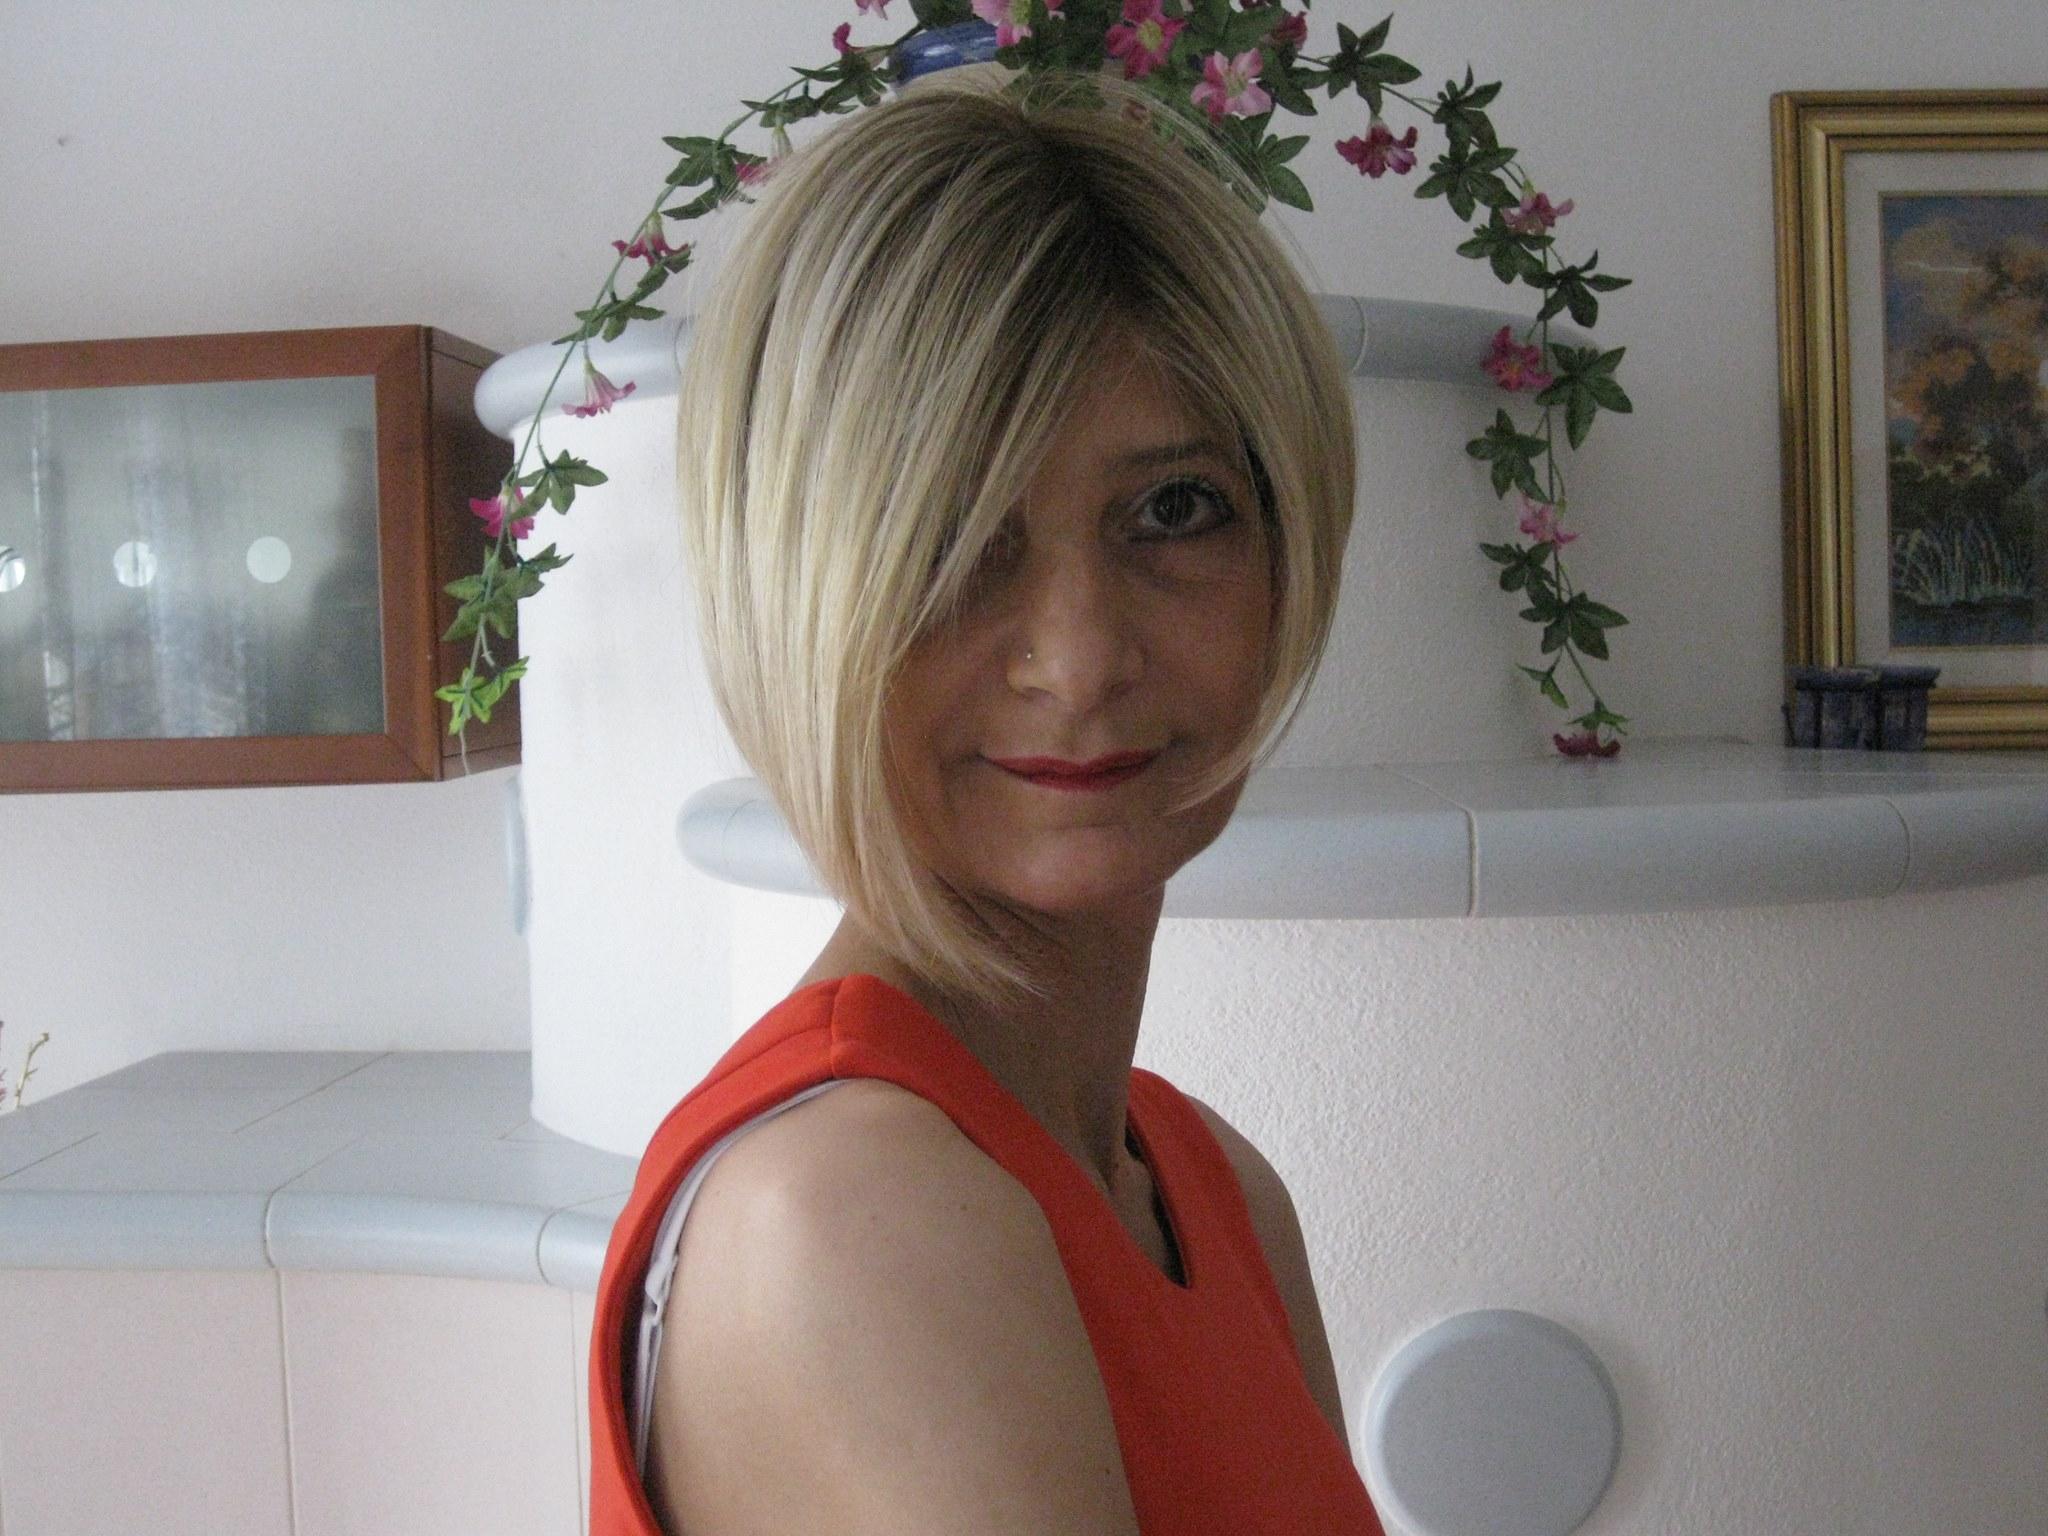 Paola Fendoni